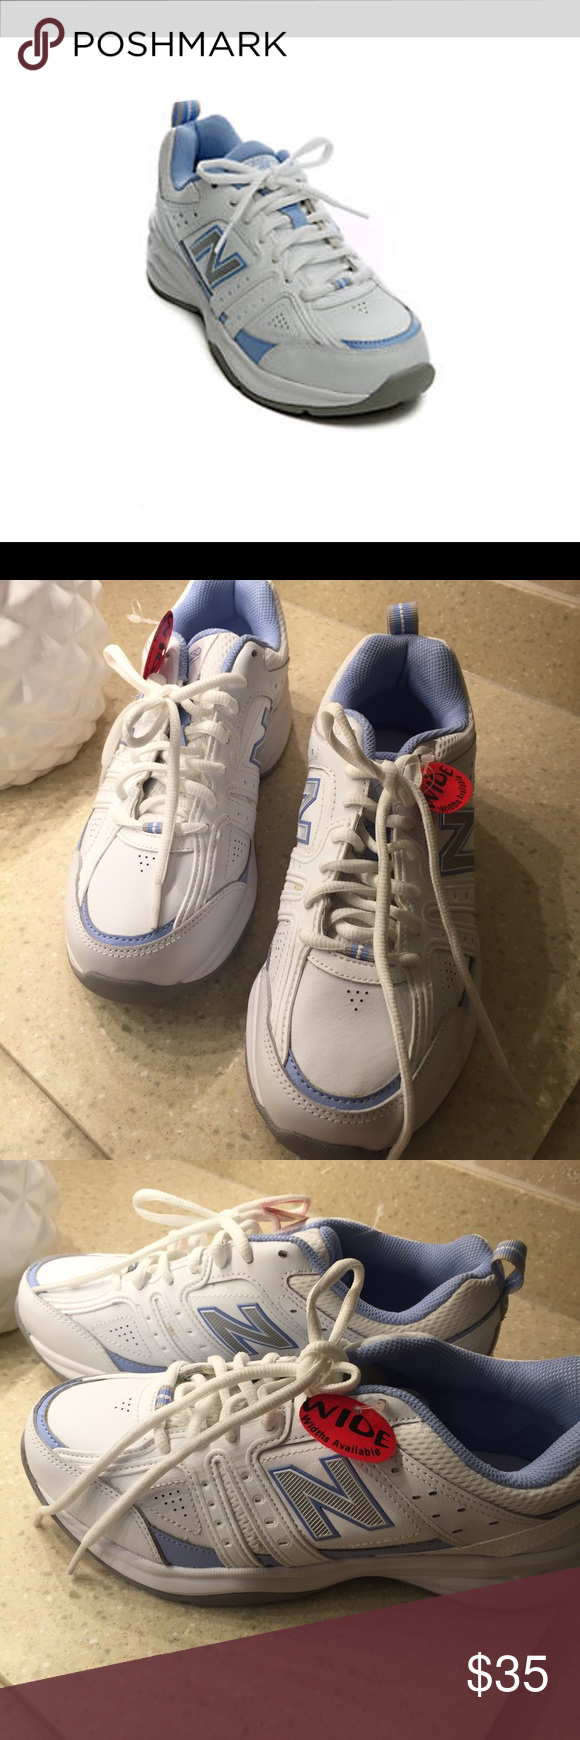 Promover prima pasajero  New Balance 401 Athletic Shoe | Athletic shoes, Shoes, New balance shoes